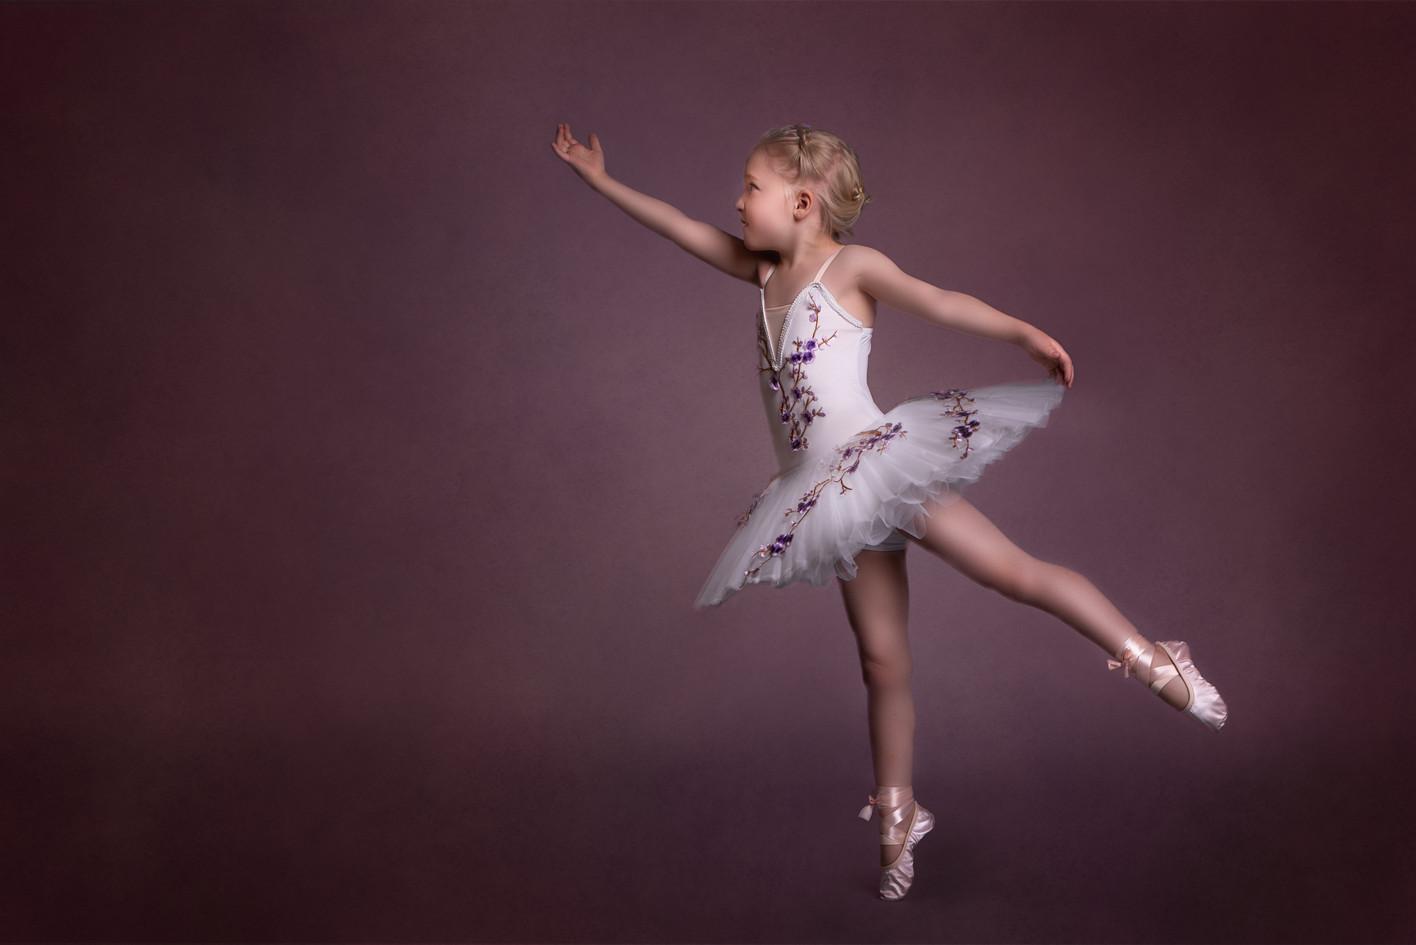 Tiny Dancer themed photographpy